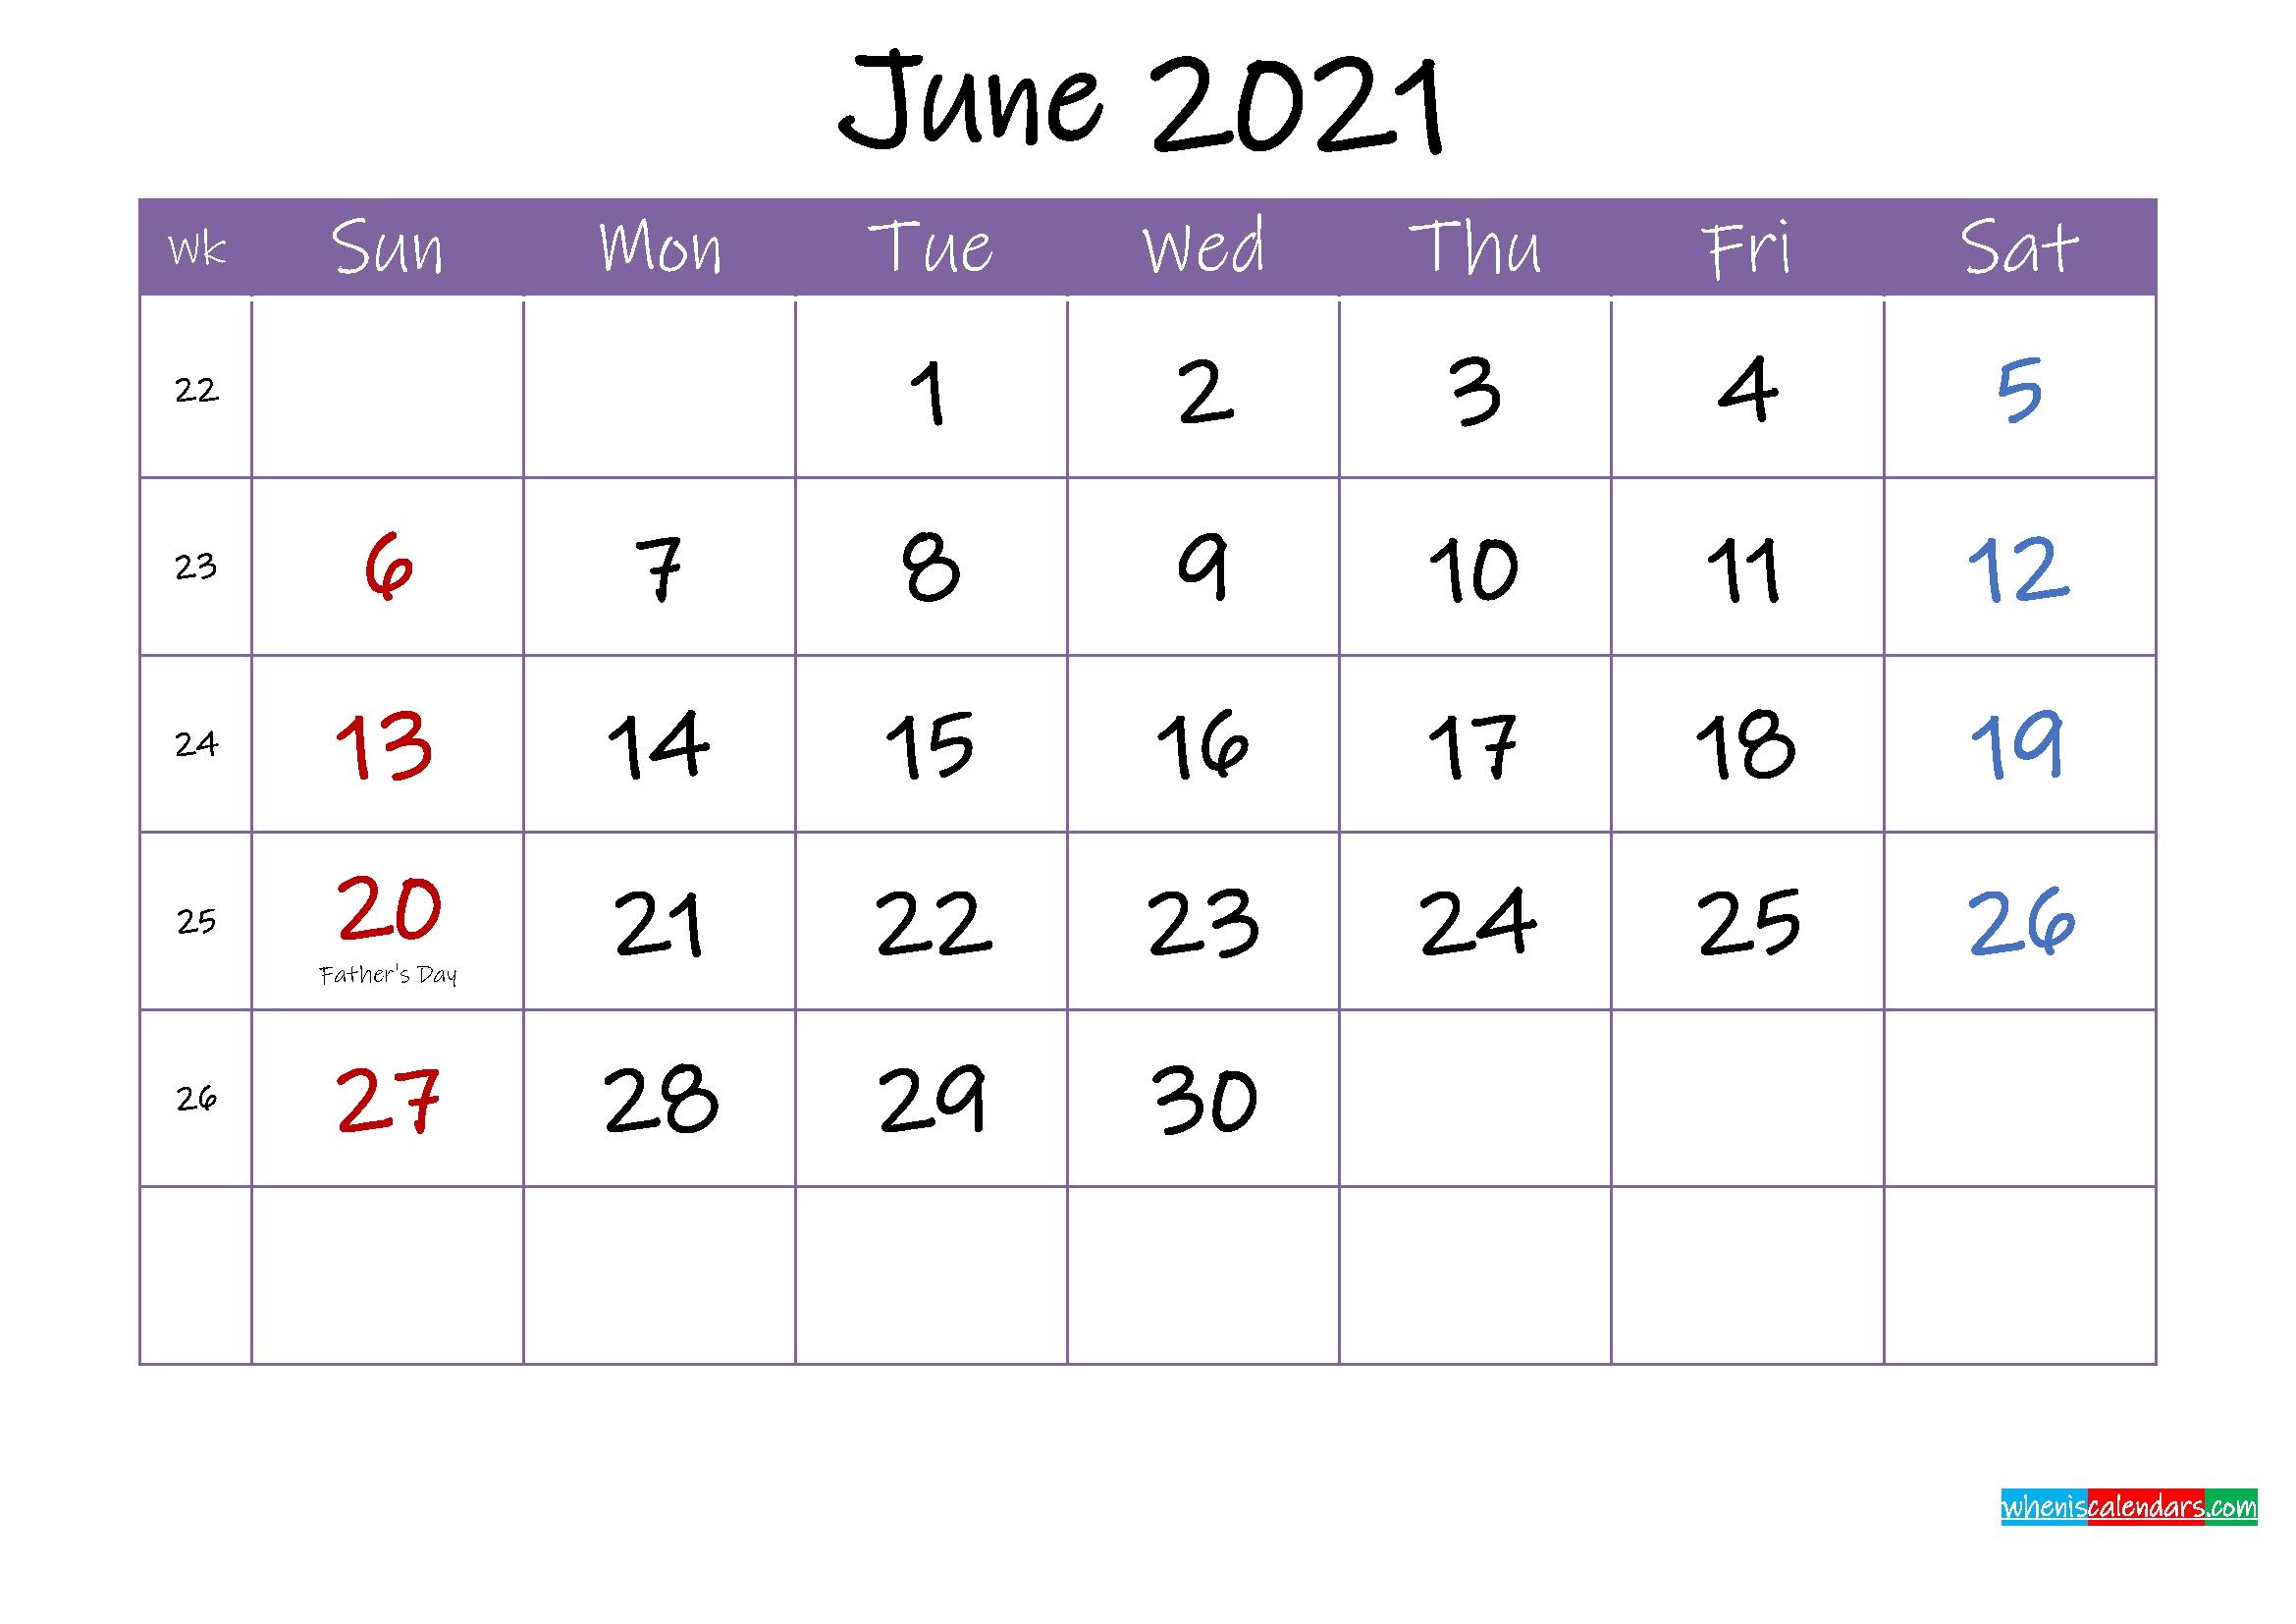 June 2021 Calendar With Holidays Printable - Template Ink21M54 June 2021 Blank Calendar Printable